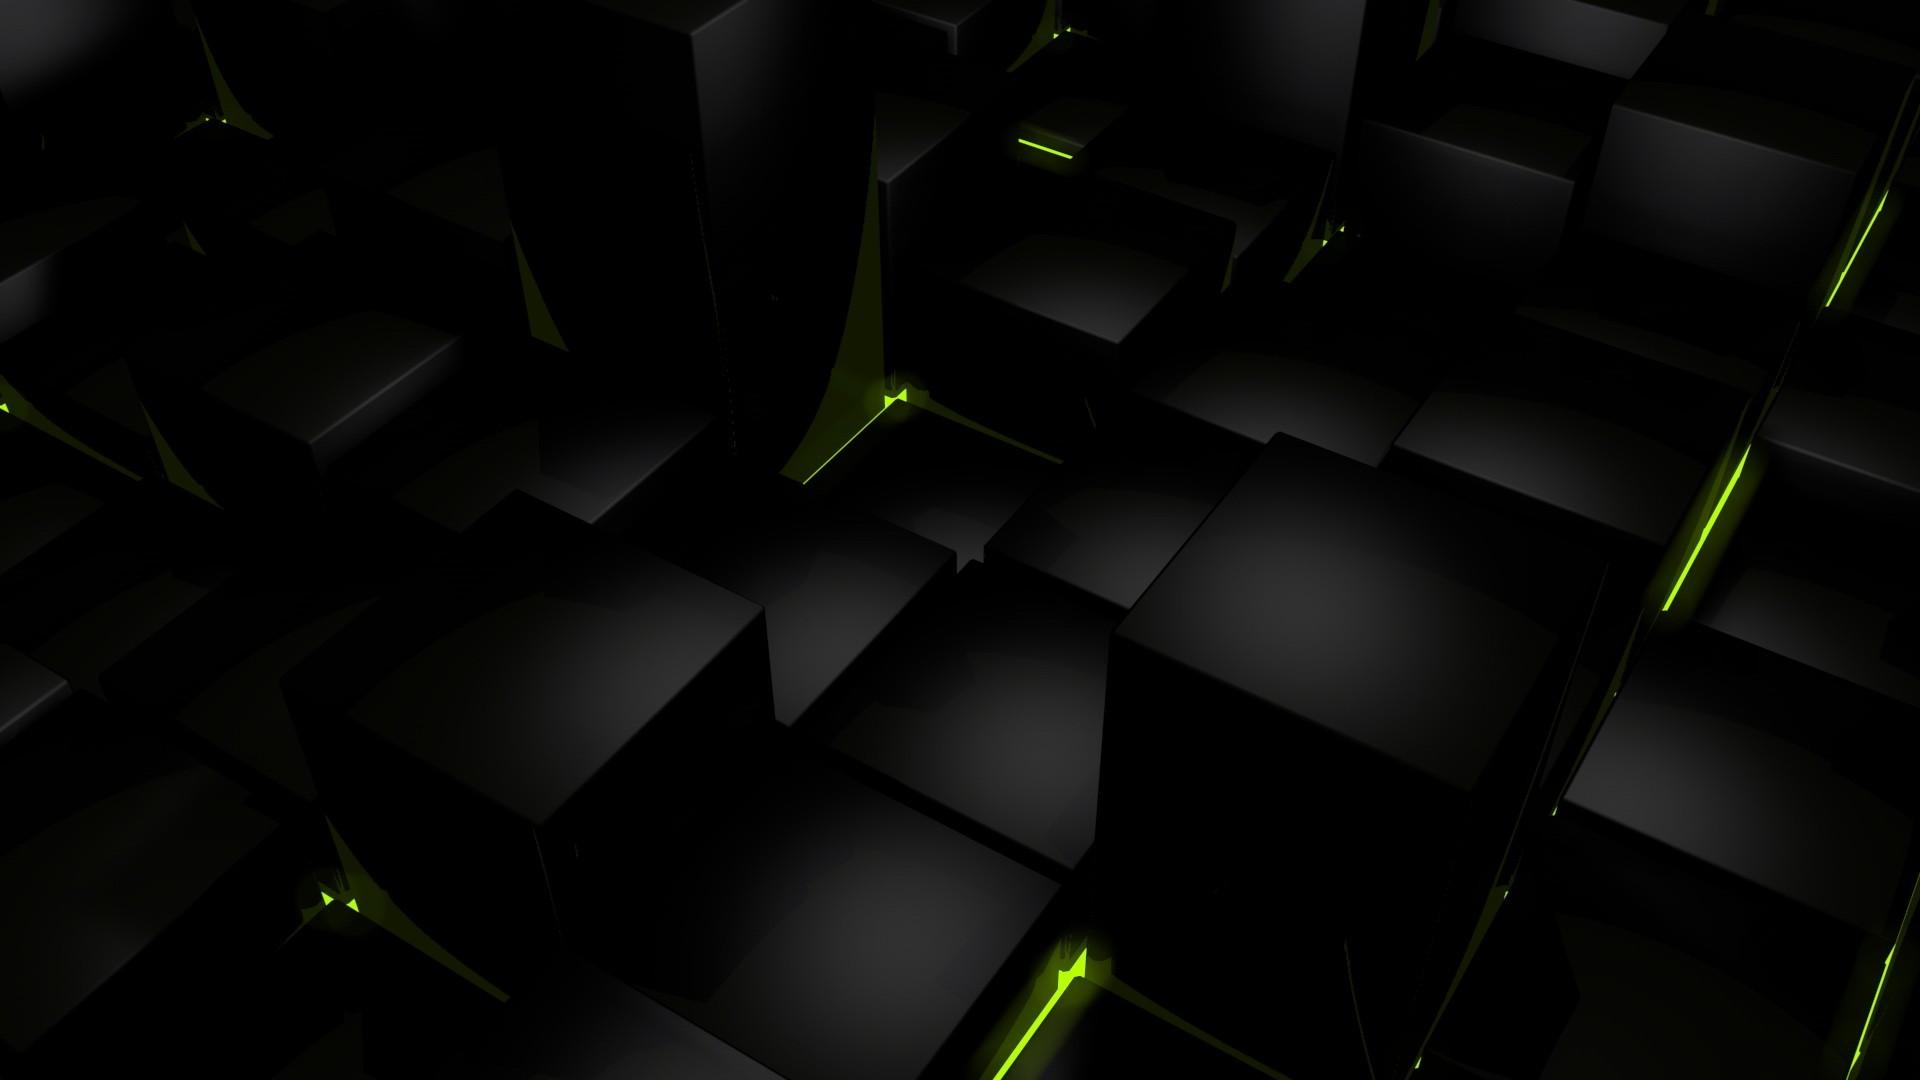 Abstract Green Consciousness Desktop WallPaper HD –  https://imashon.com/w/abstract-green-consciousness-desktop-wallpaper-hd.html    WallPapers   Pinterest …